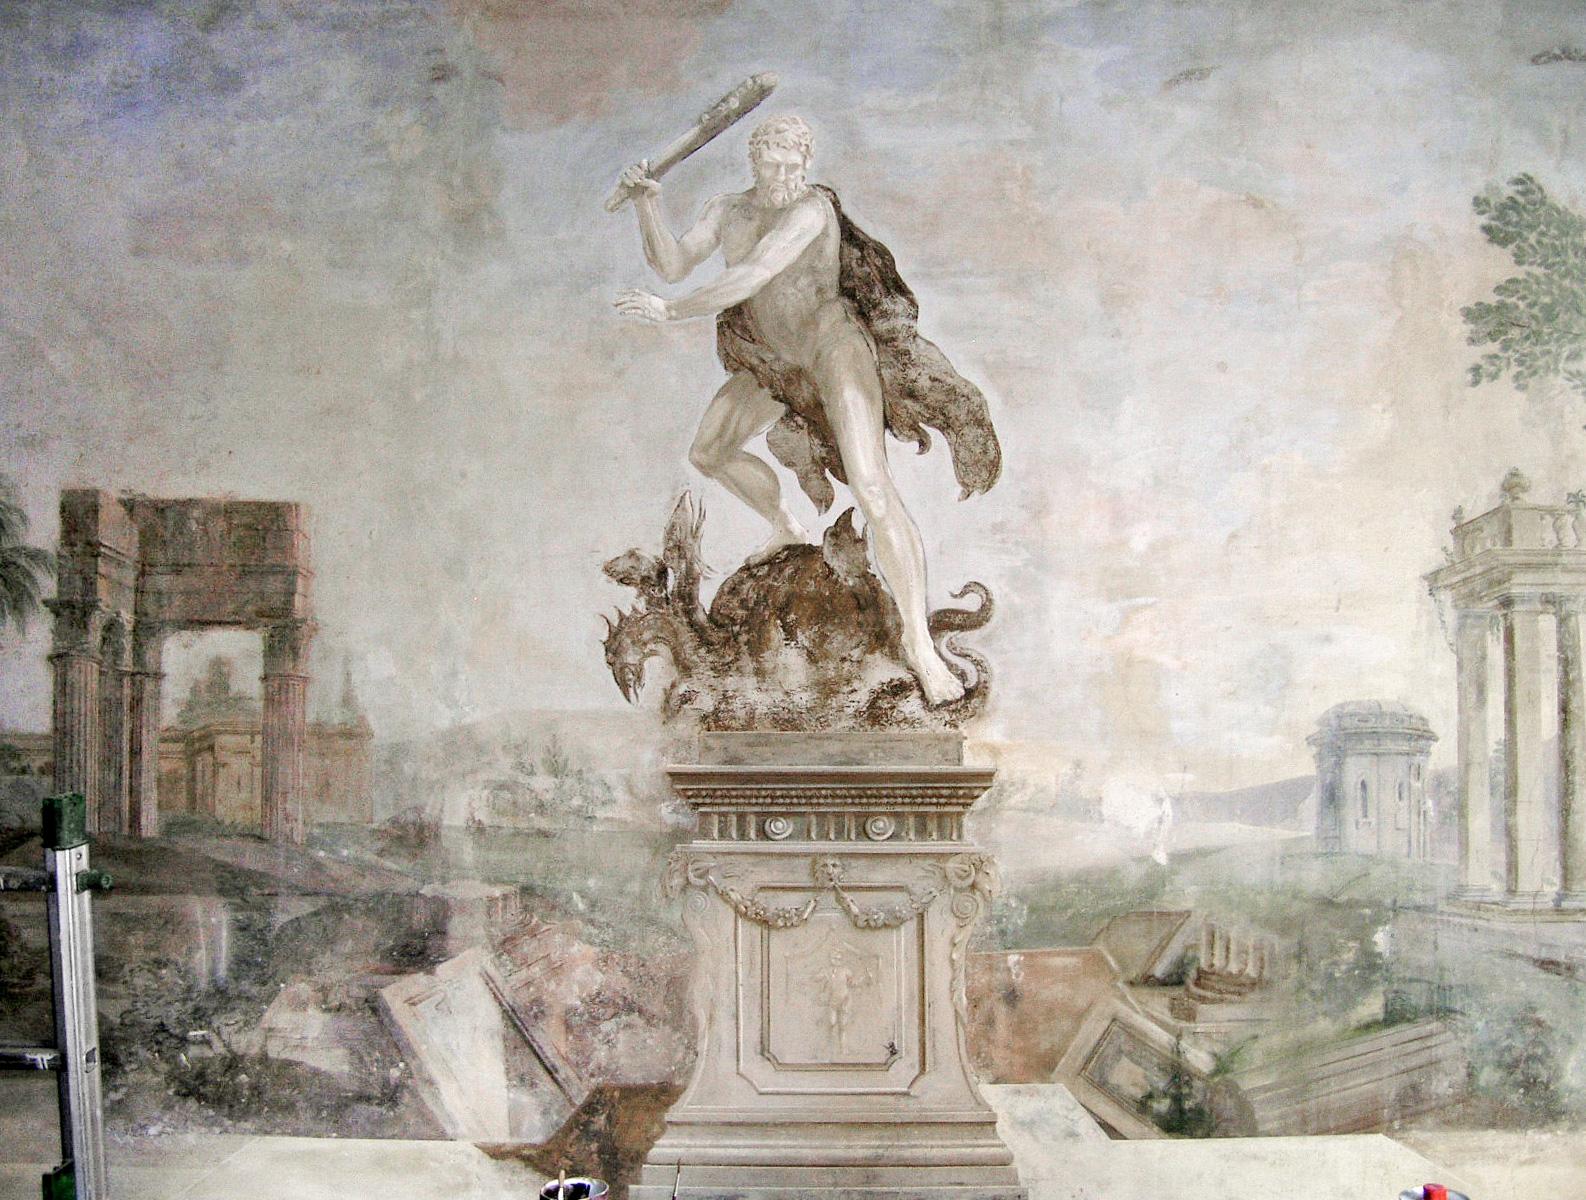 Hercules fresco - Alexander Hamilton - Decorative Painter - London